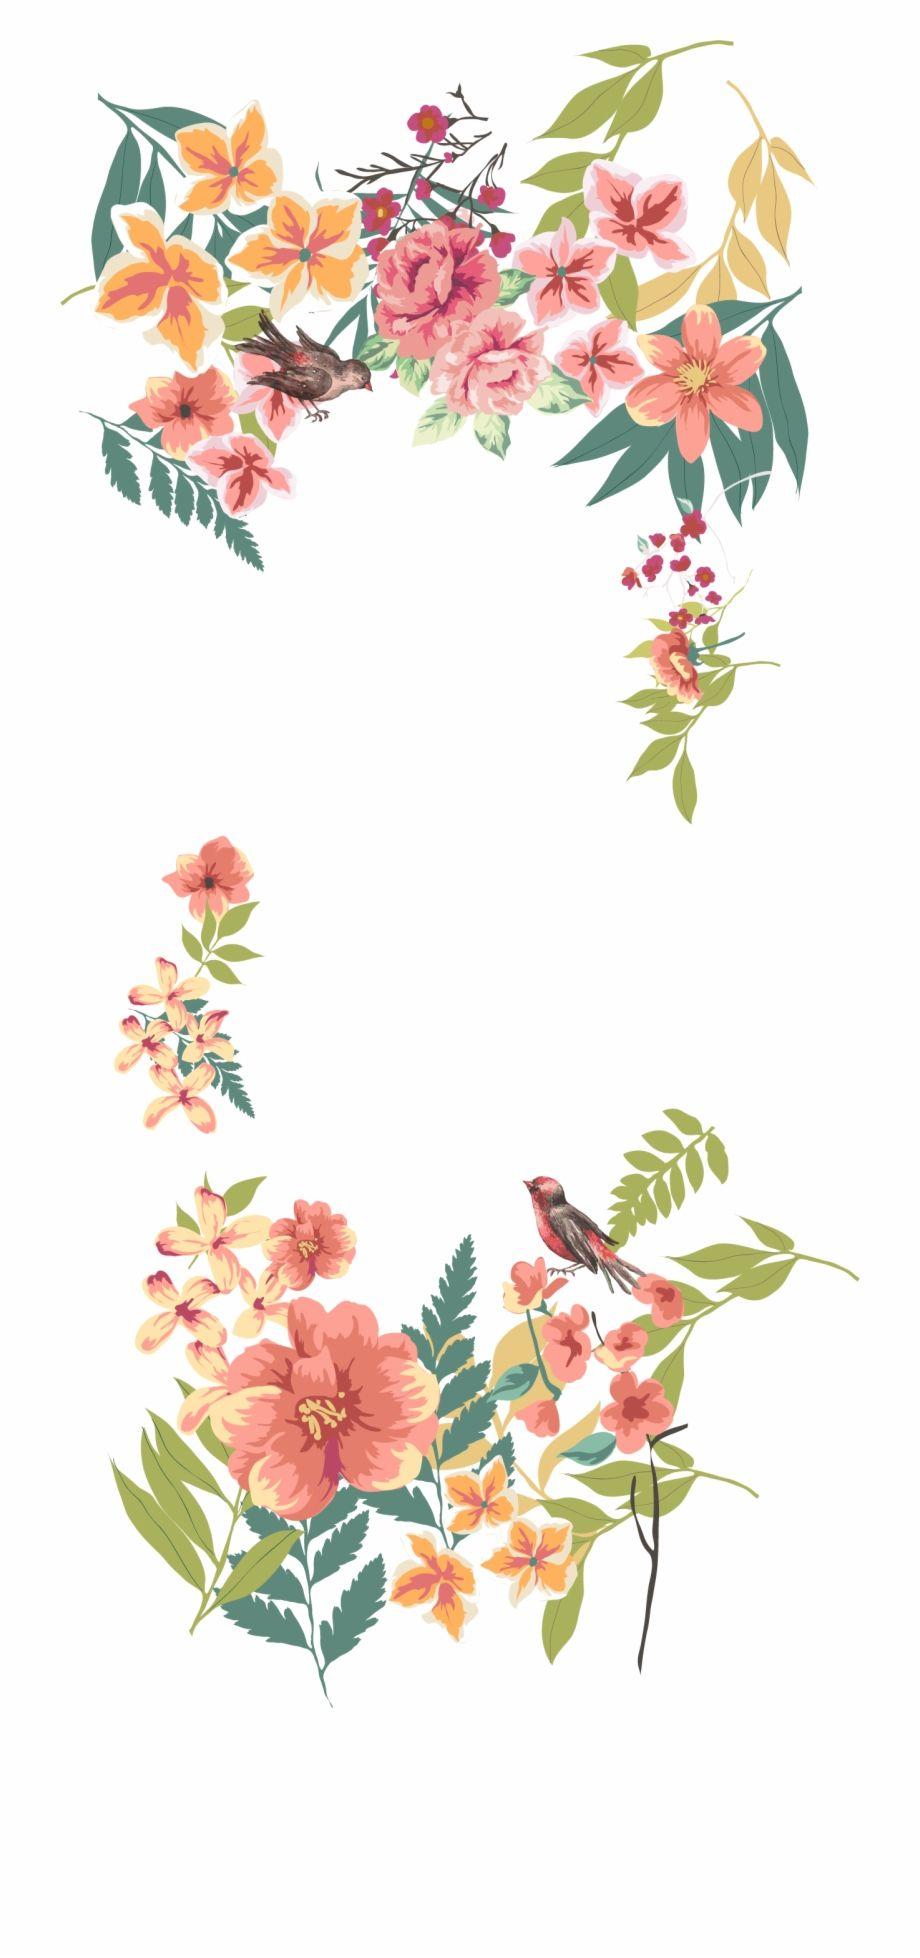 Flower Euclidean Vector Floral Design Free Vintage Vector Flowers Png Is A Free Transparent Png Image Vector Flowers Floral Design Drawing Flower Frame Png